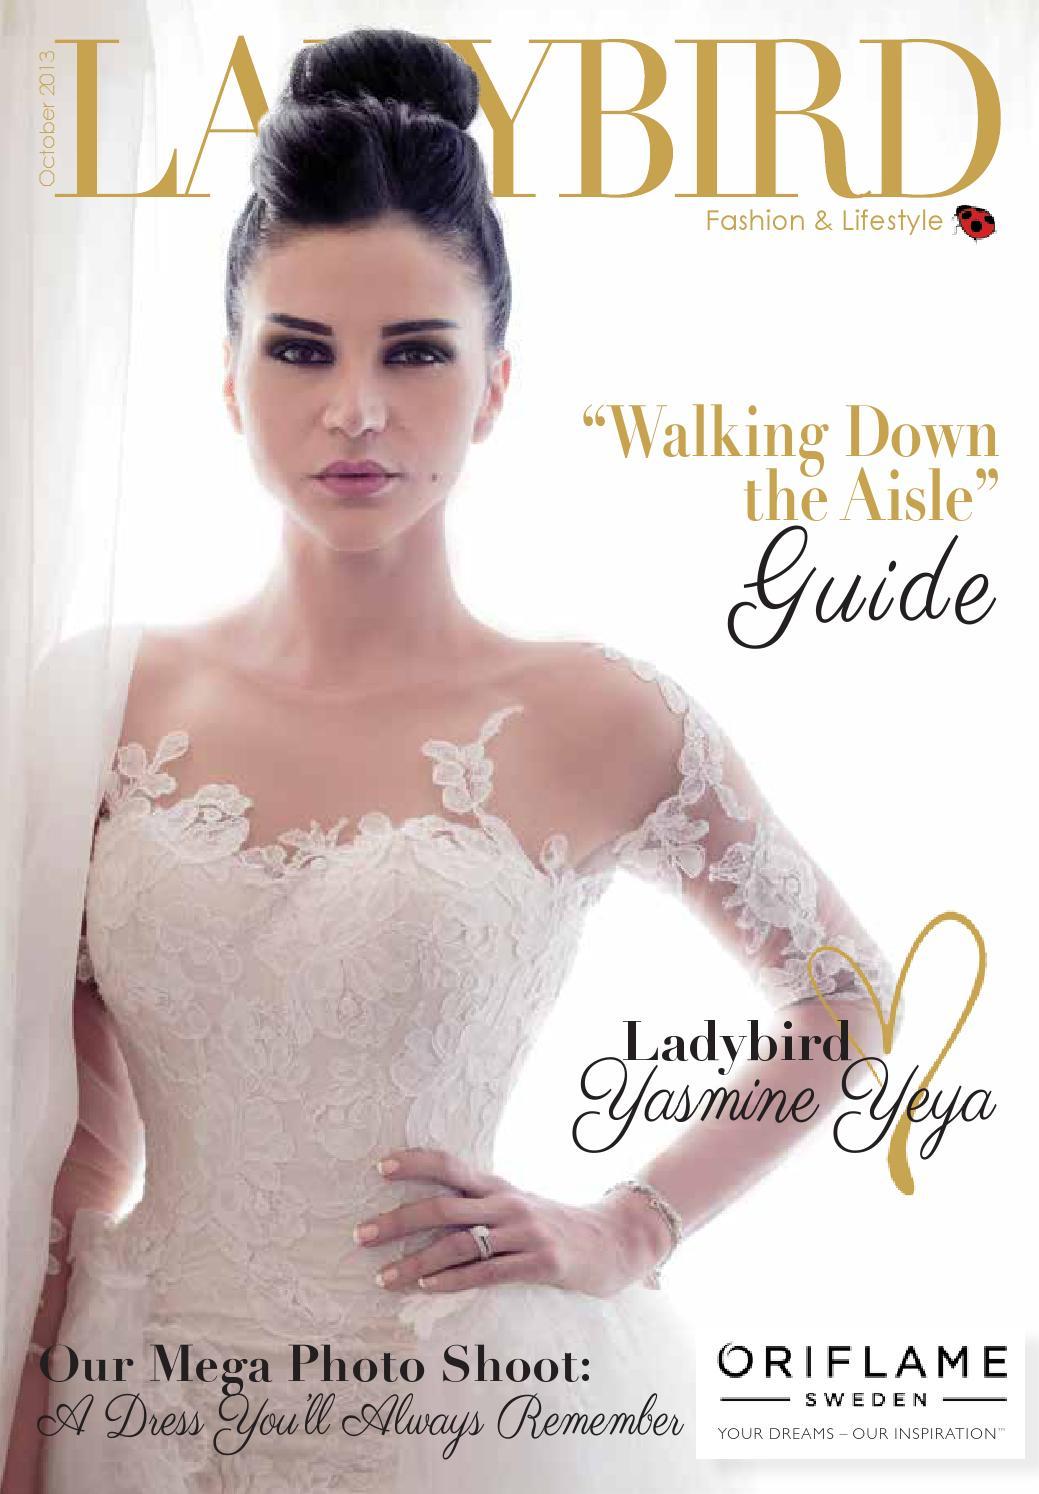 ladybird magazine may's issuesky press - issuu